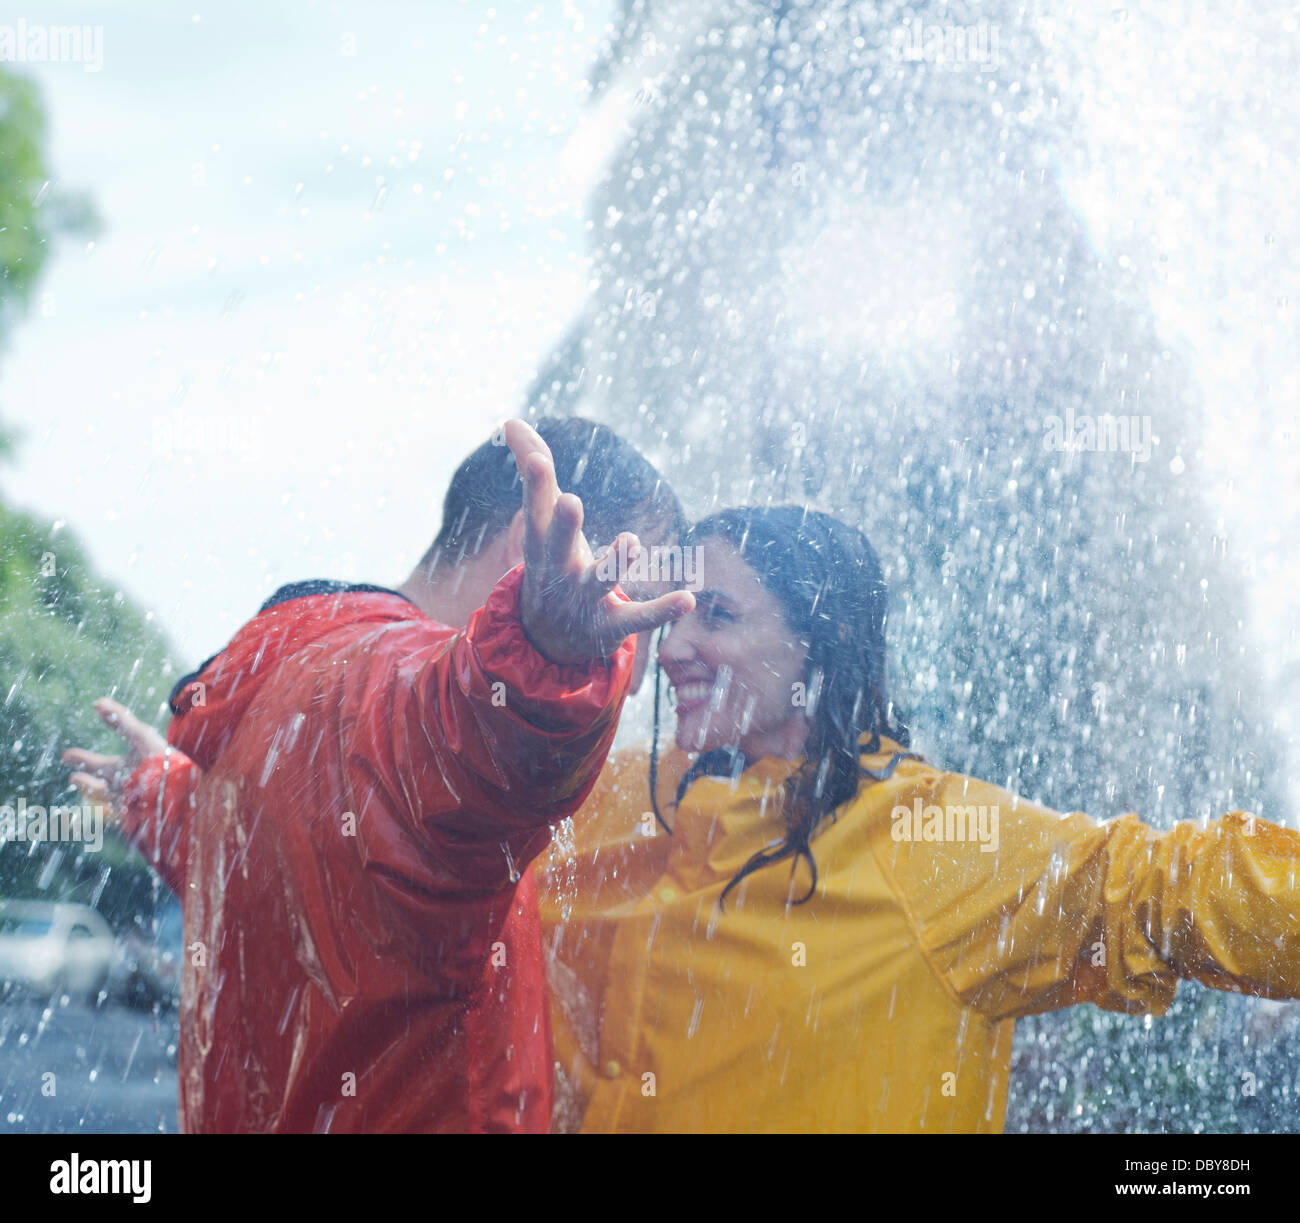 Happy couple dancing in rain - Stock Image